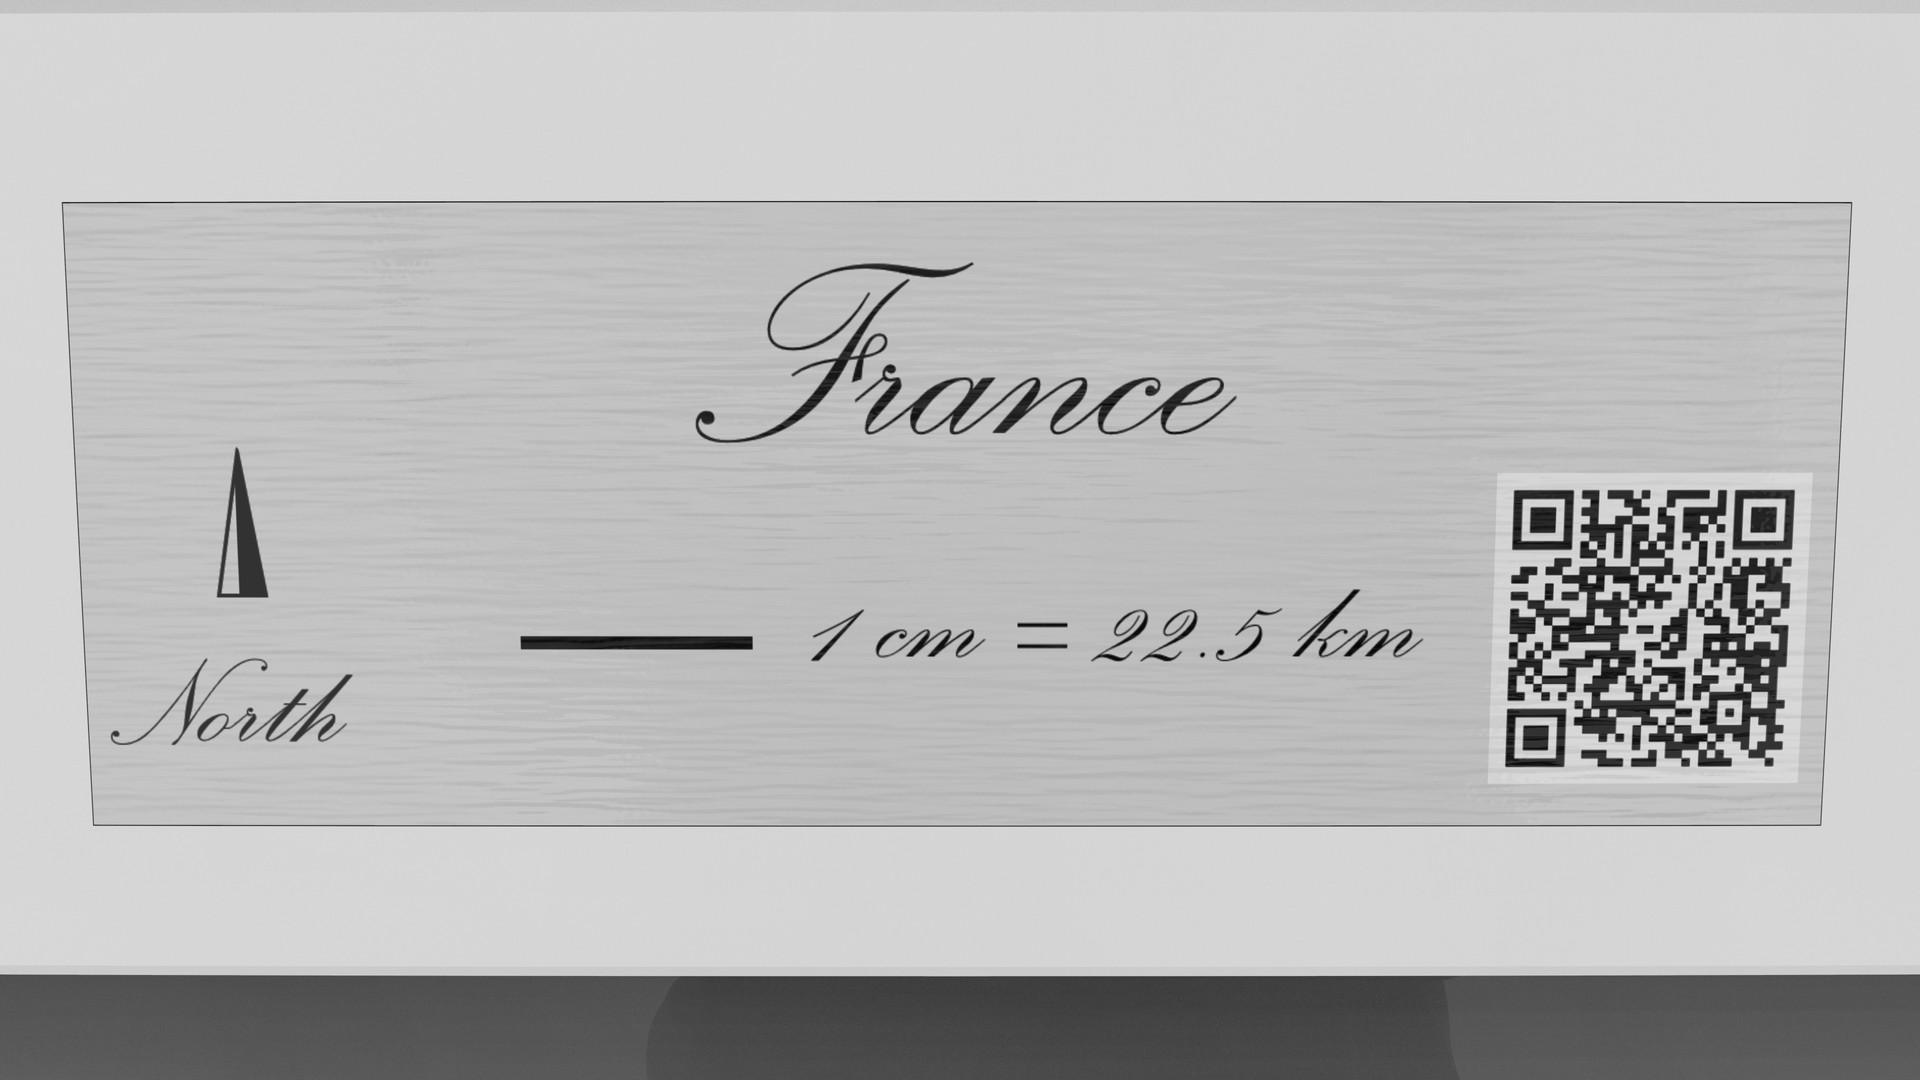 France image2.110.jpg